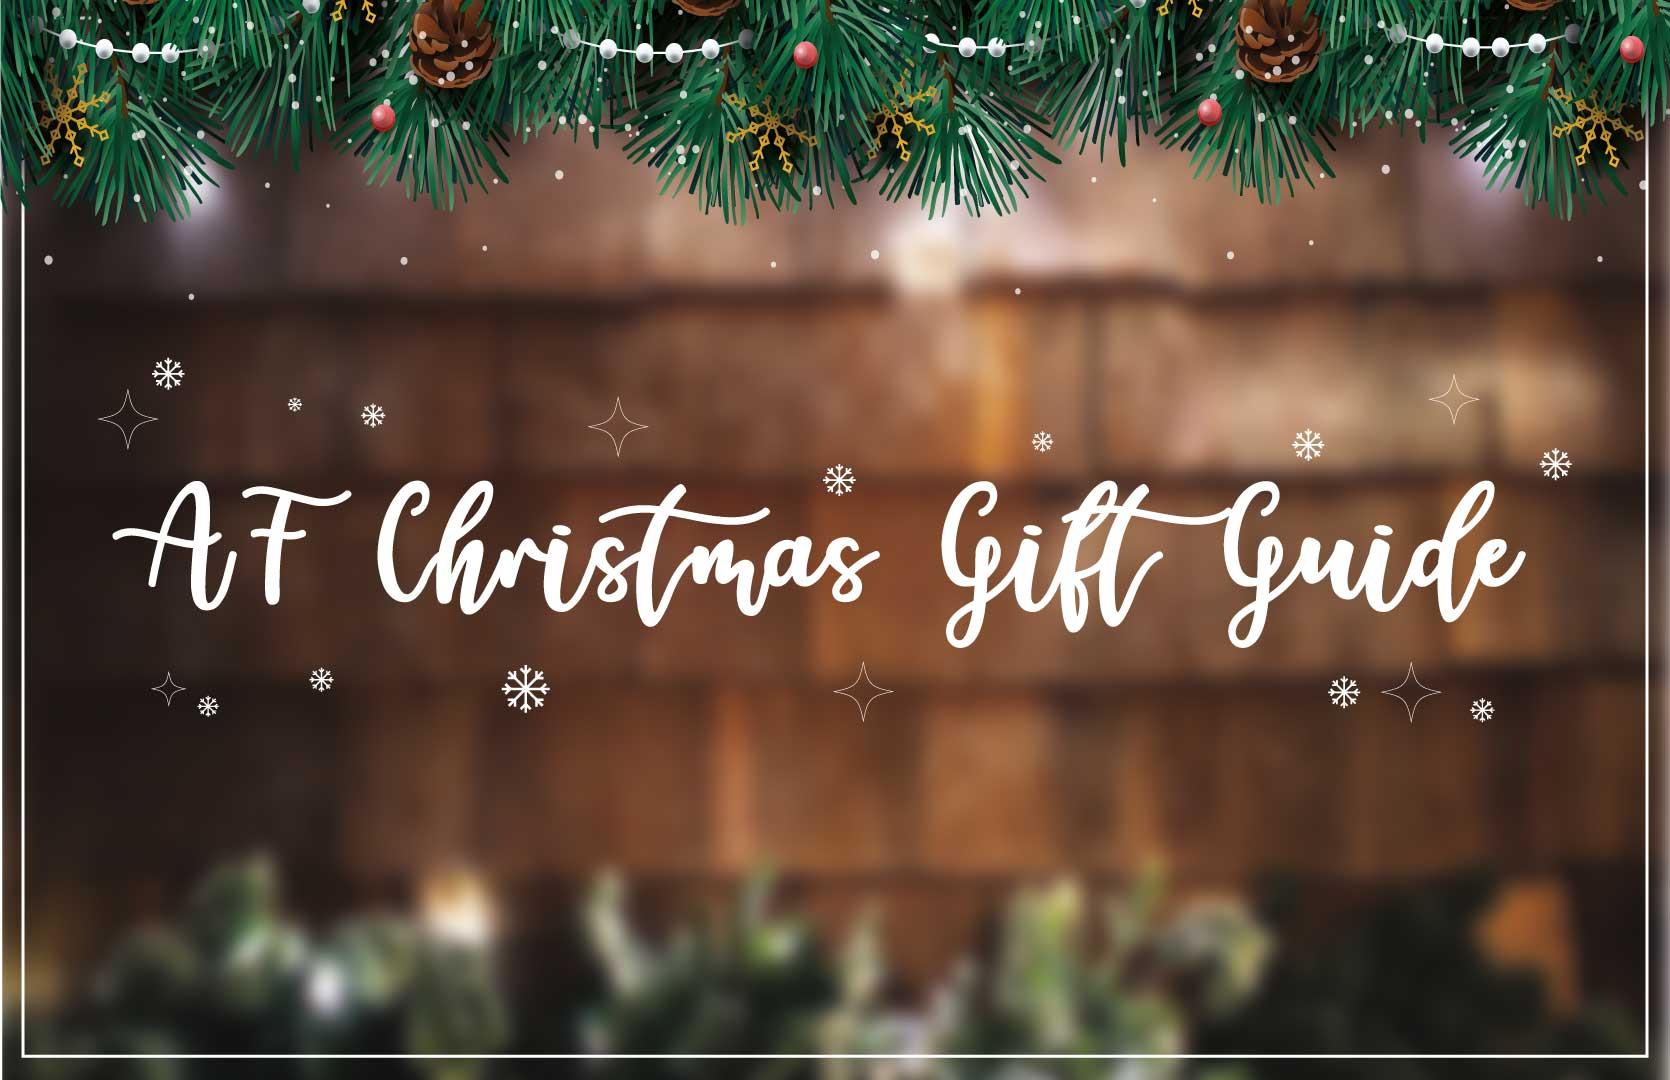 AF Christmas Gift Guide